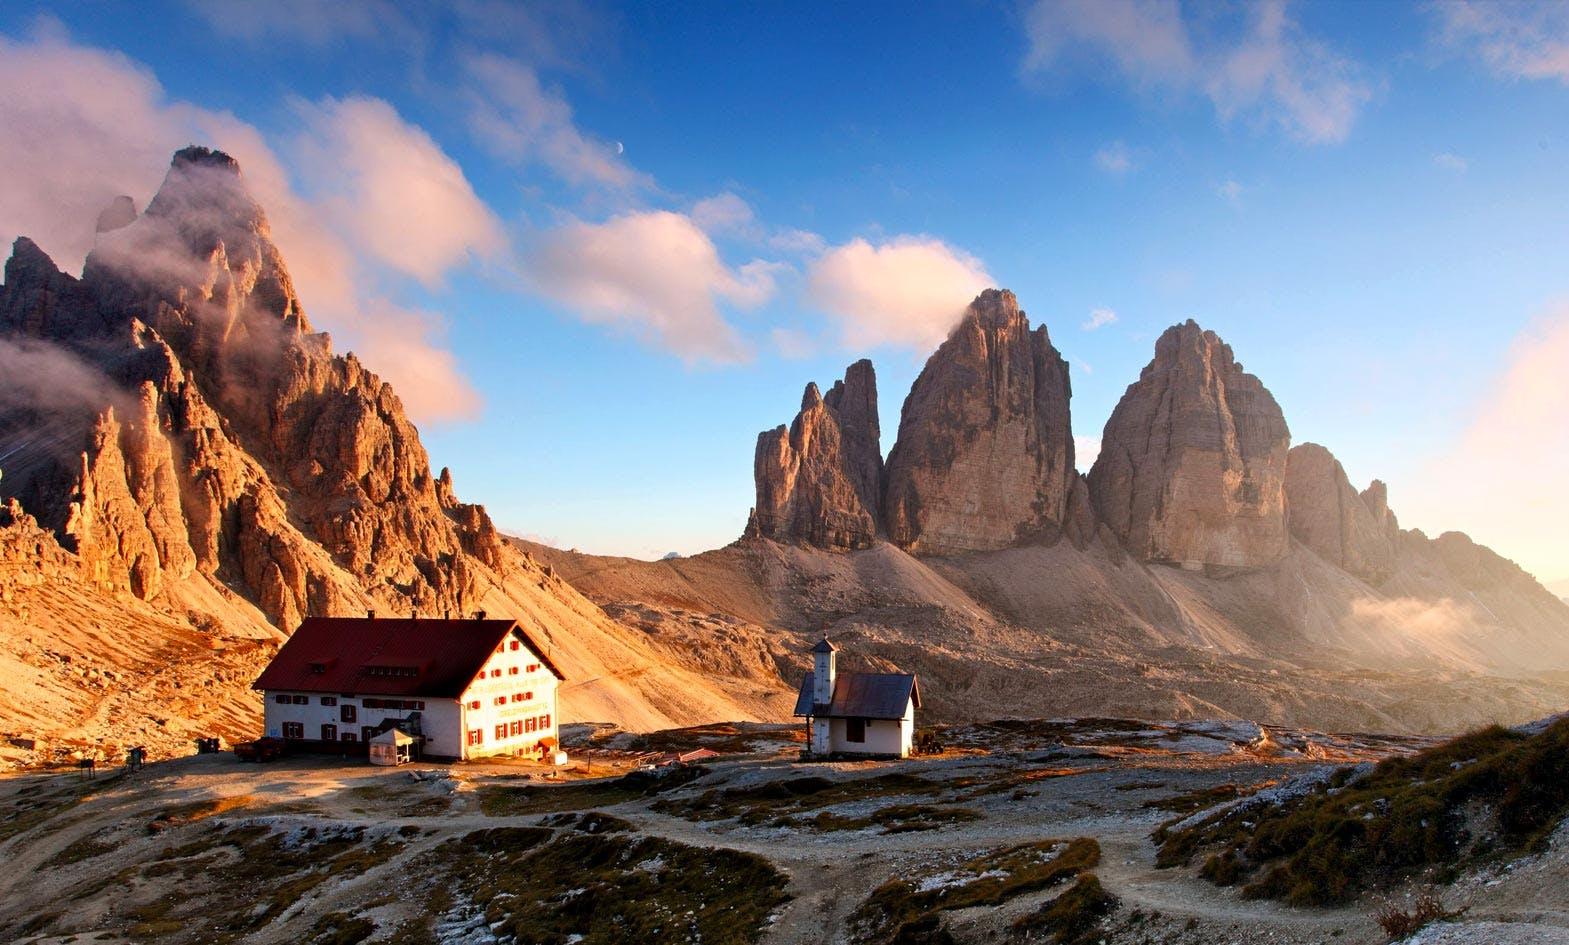 Sunrise Rifugio Dolomites Hut-to-hut Hiking Adventure Tours